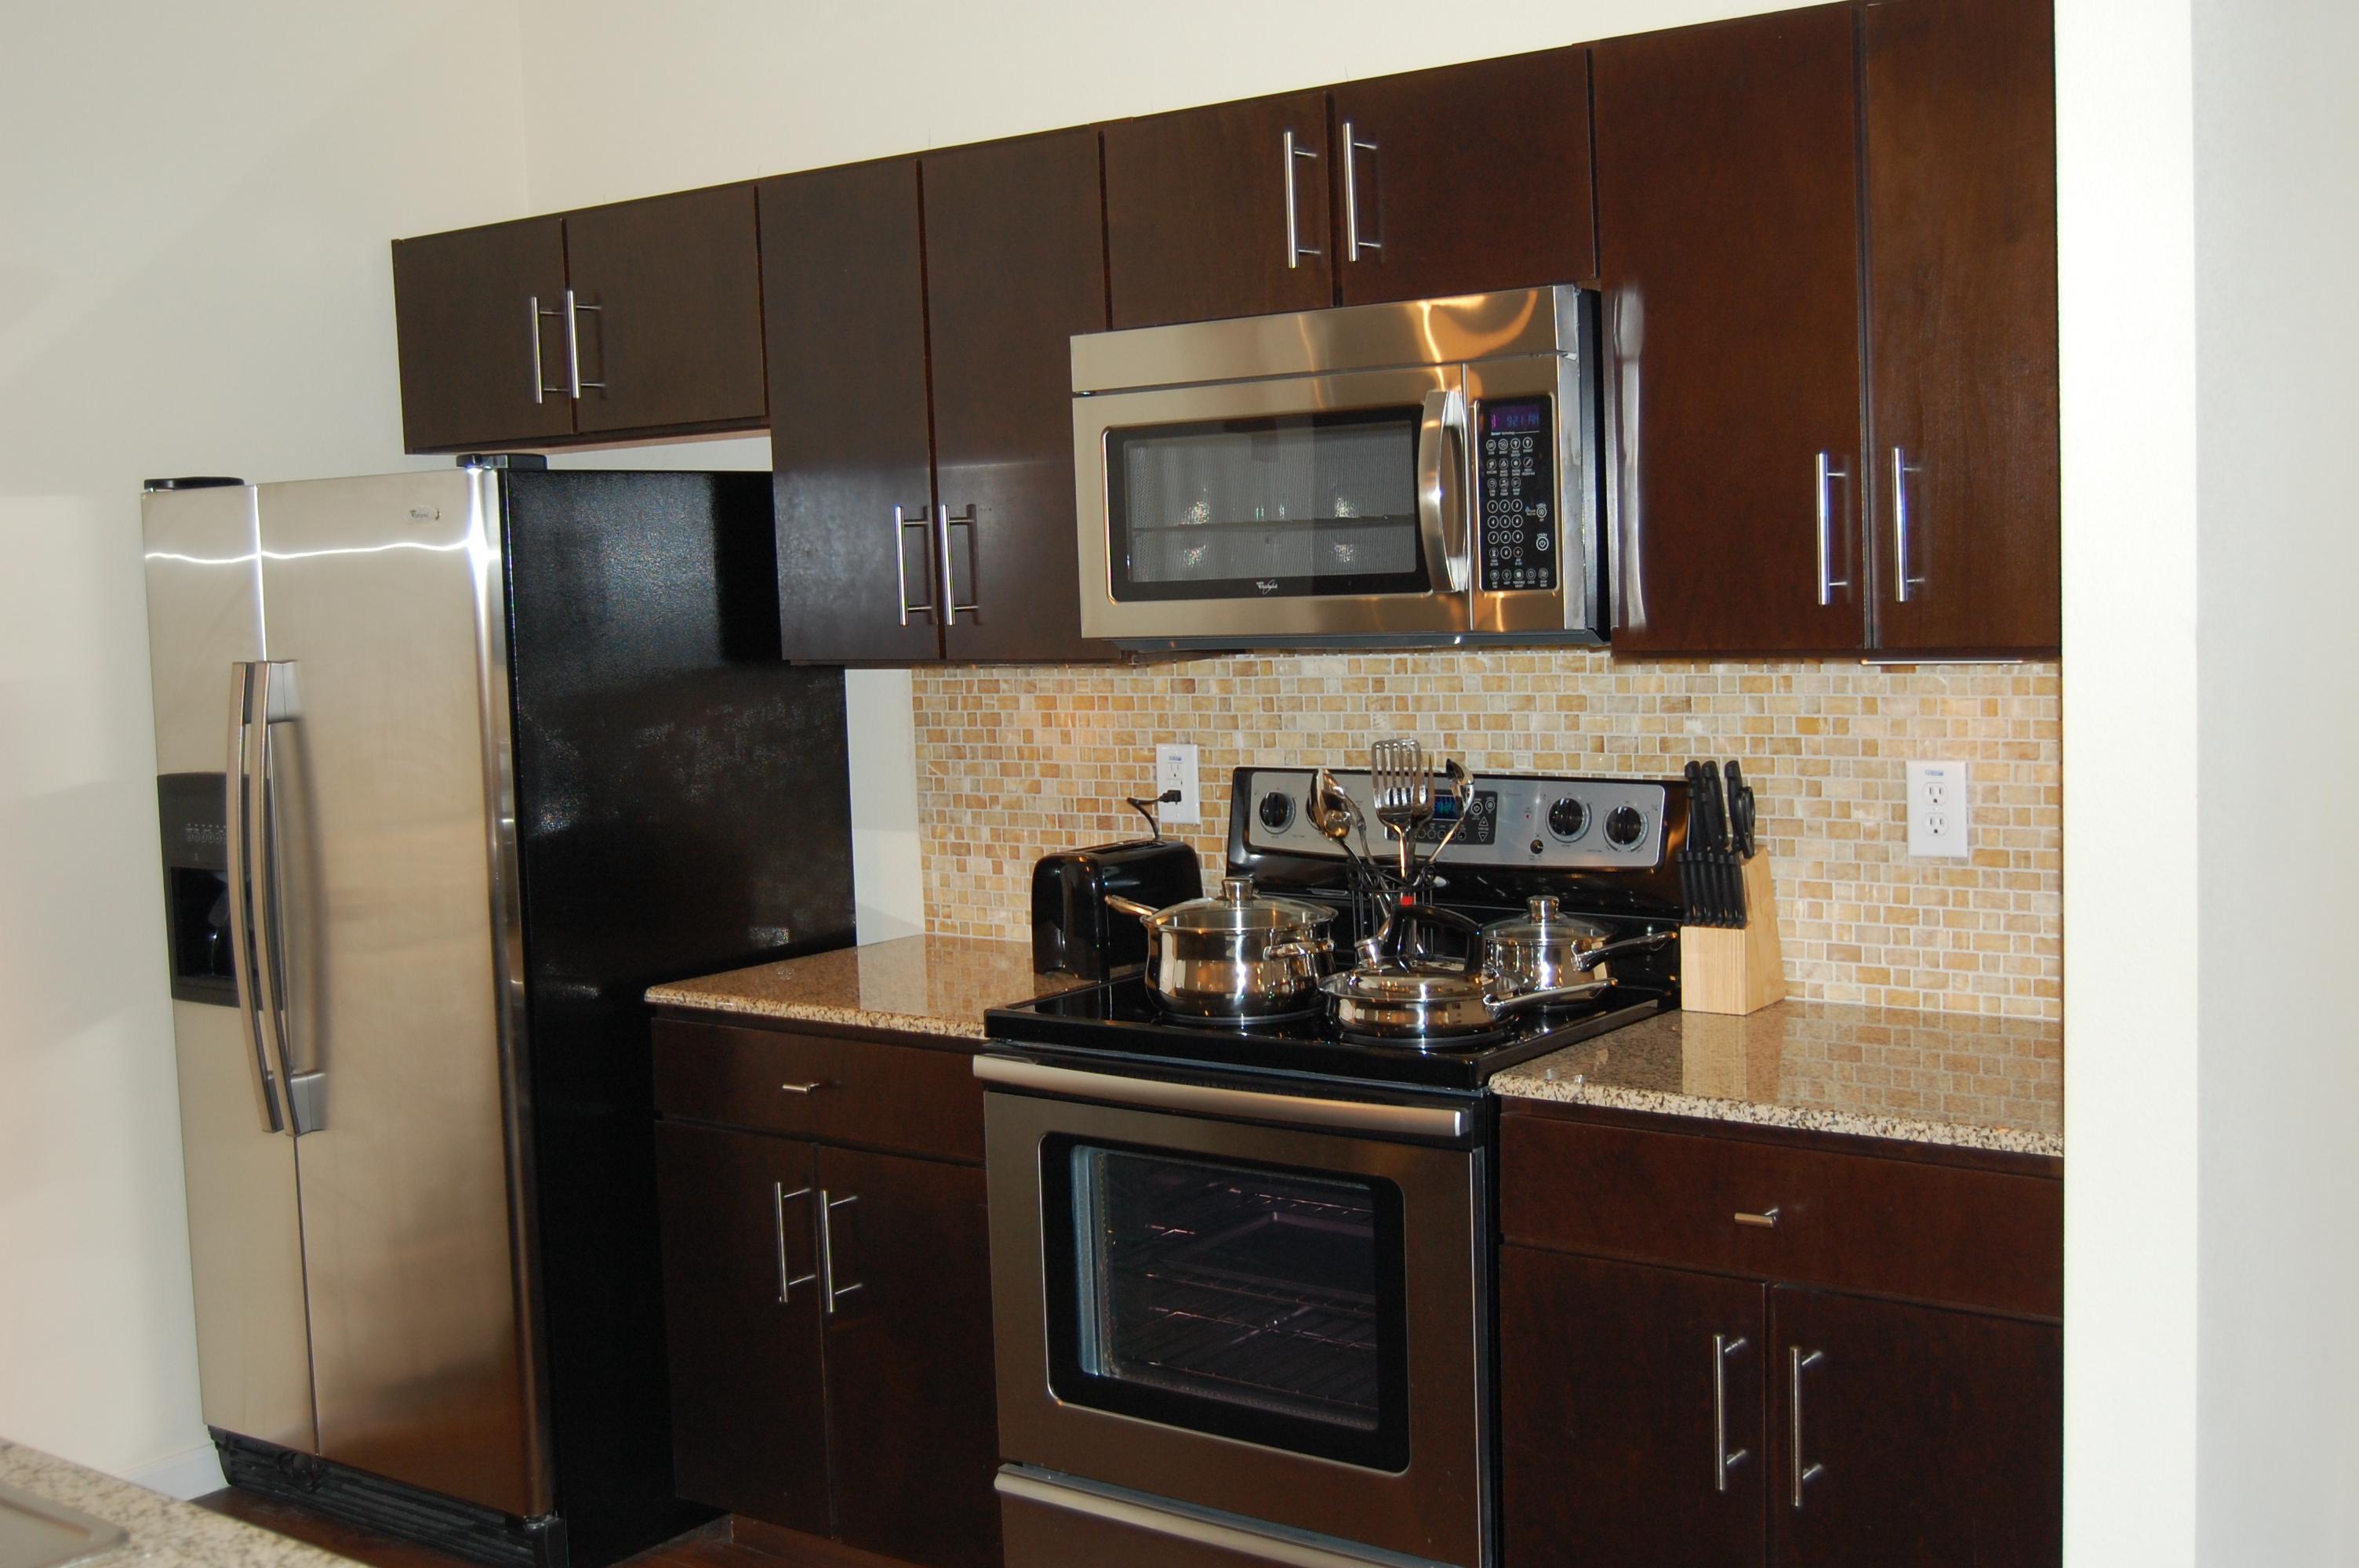 Lofts-at-City-Centre-kitchen